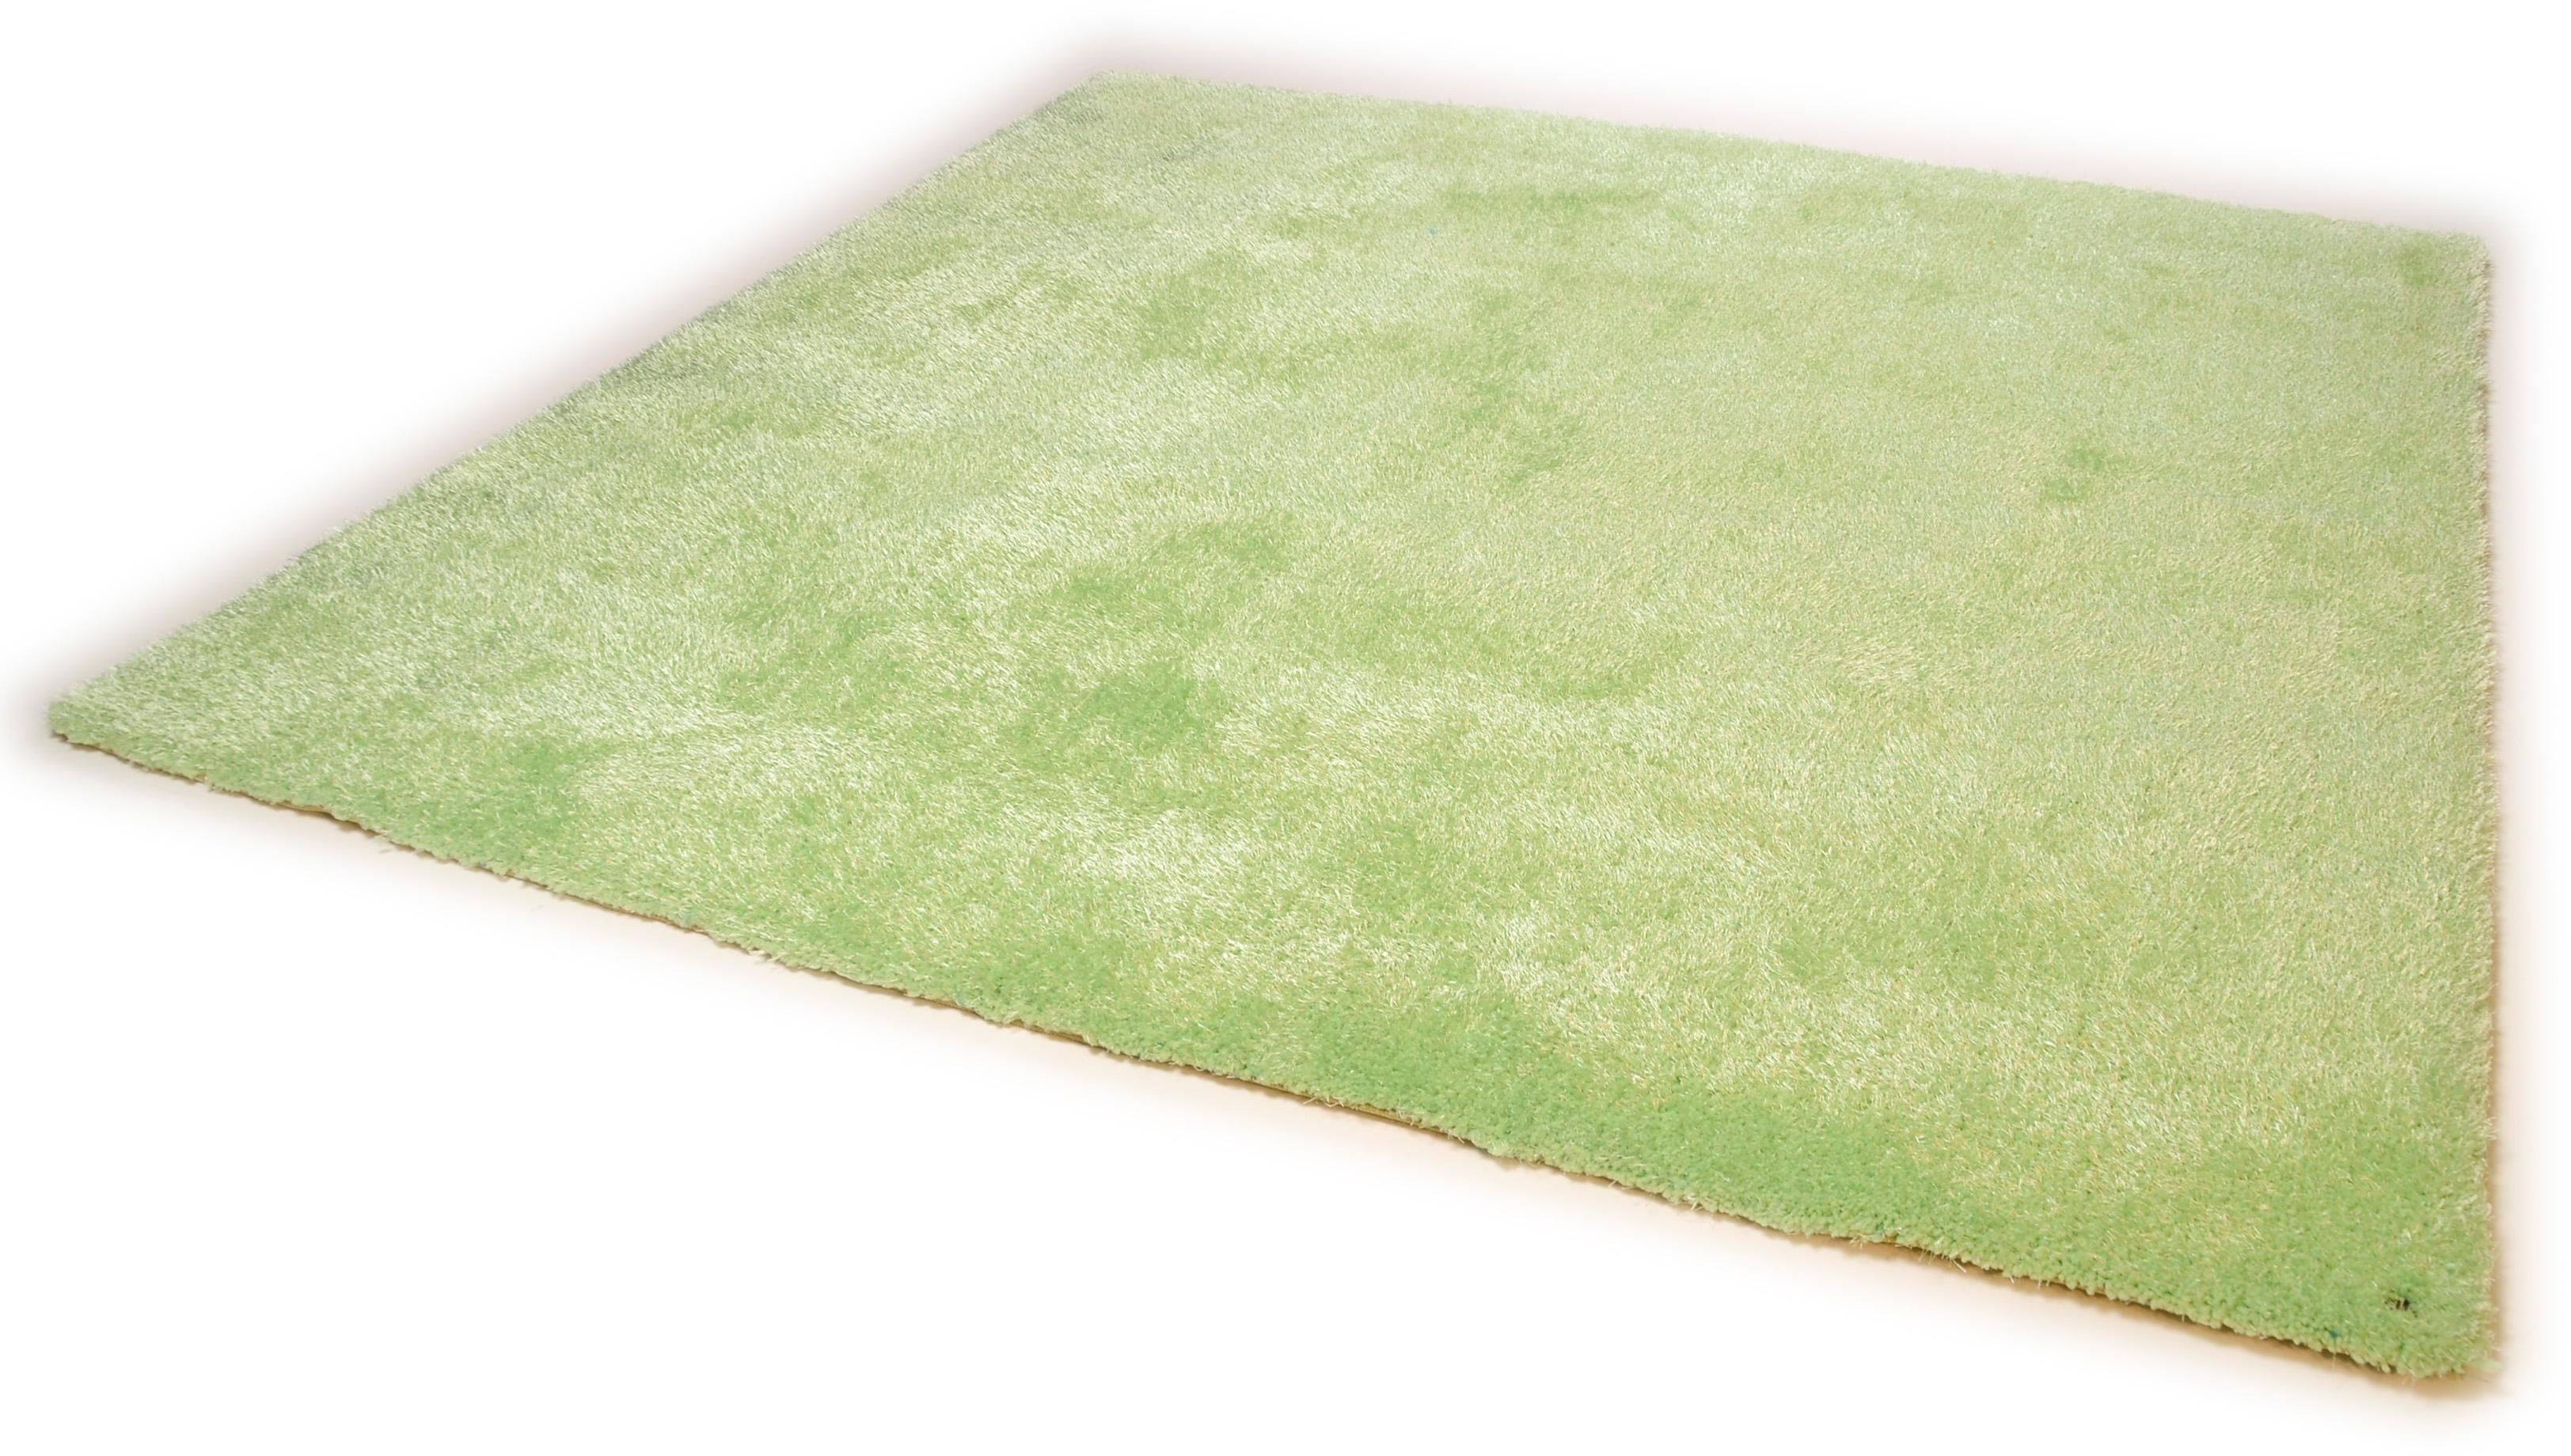 Tom Tailor Hoogpolig vloerkleed, »Soft«, hoogte 35 mm, handgetuft nu online bestellen